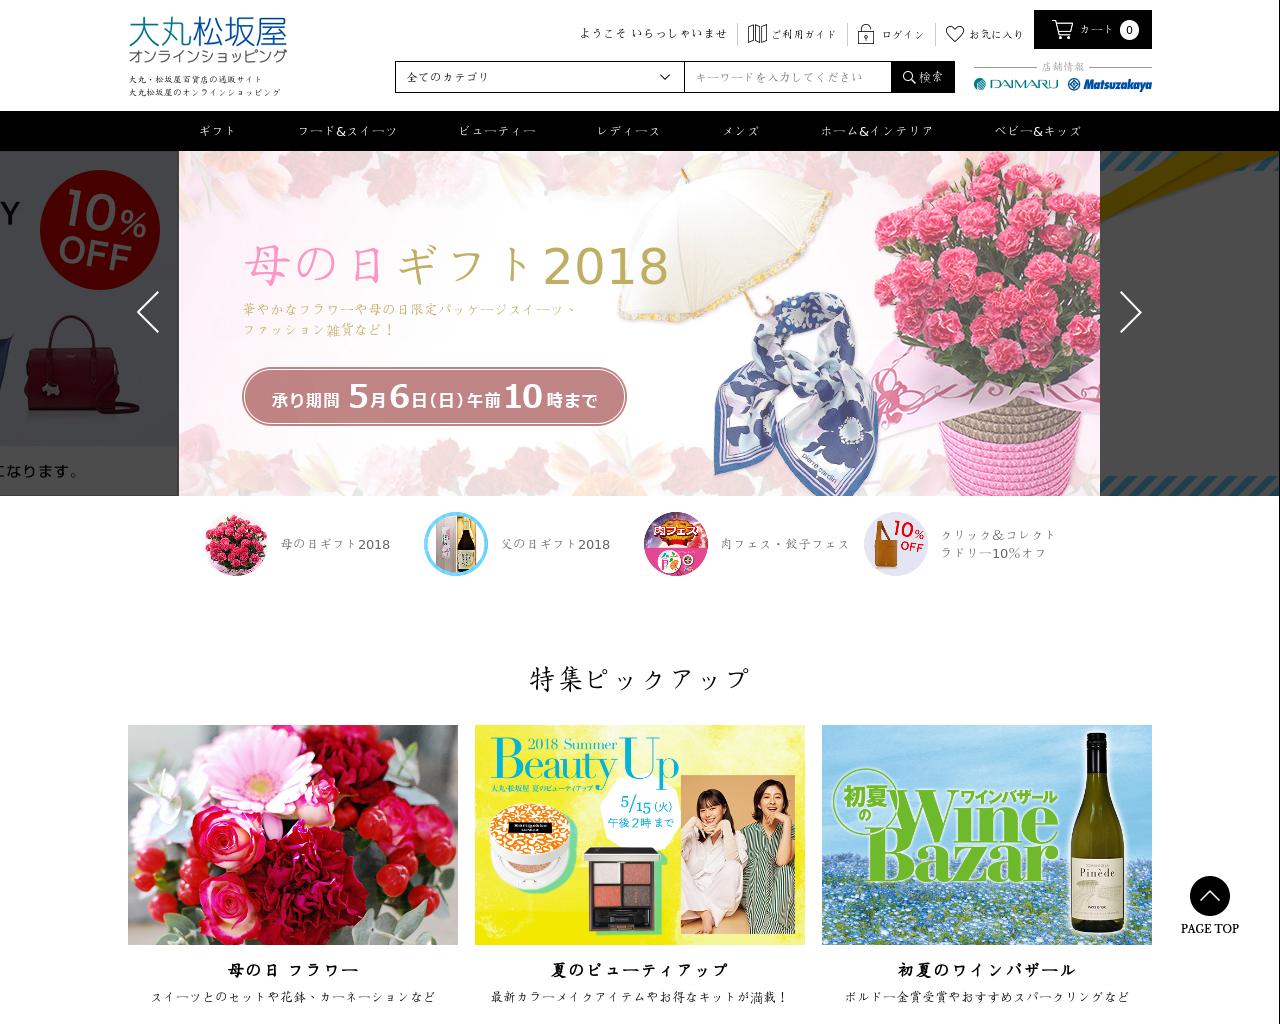 www.daimaru-matsuzakaya.jp(2018/05/03 00:00:40)